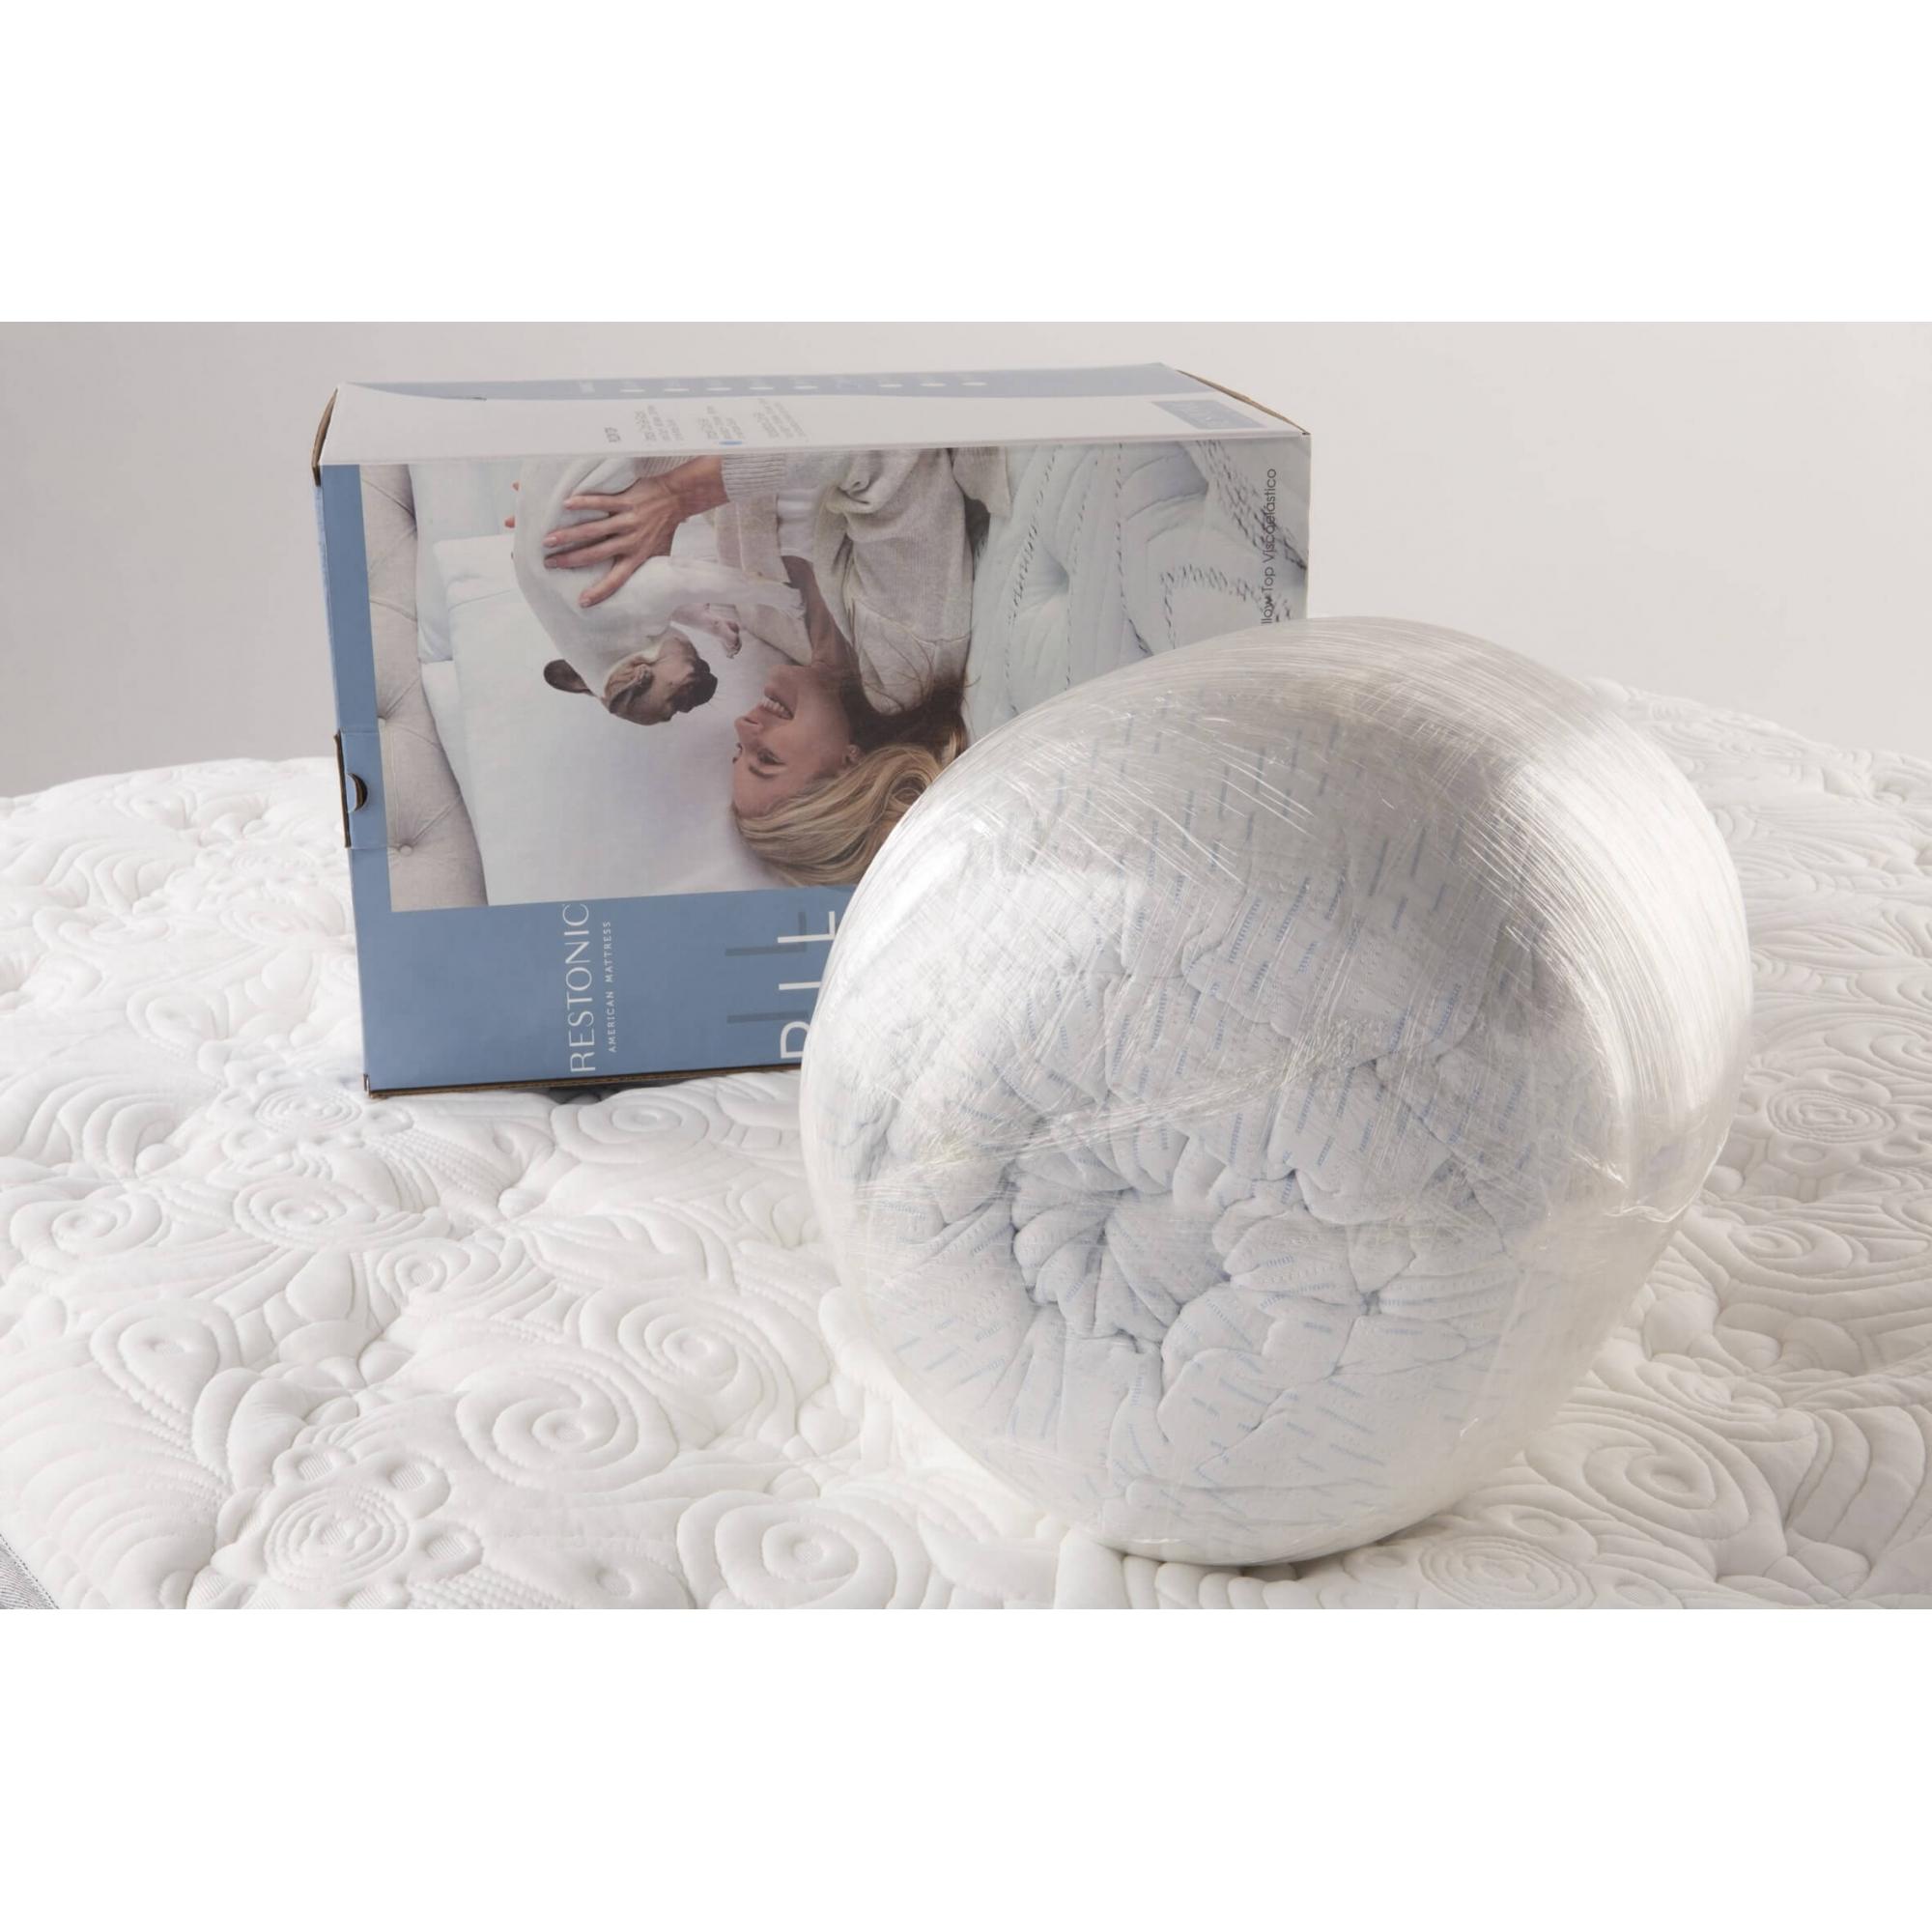 Pillow Top Restonic Visco Coolgelpad King 1,93x2,03x4 Cm